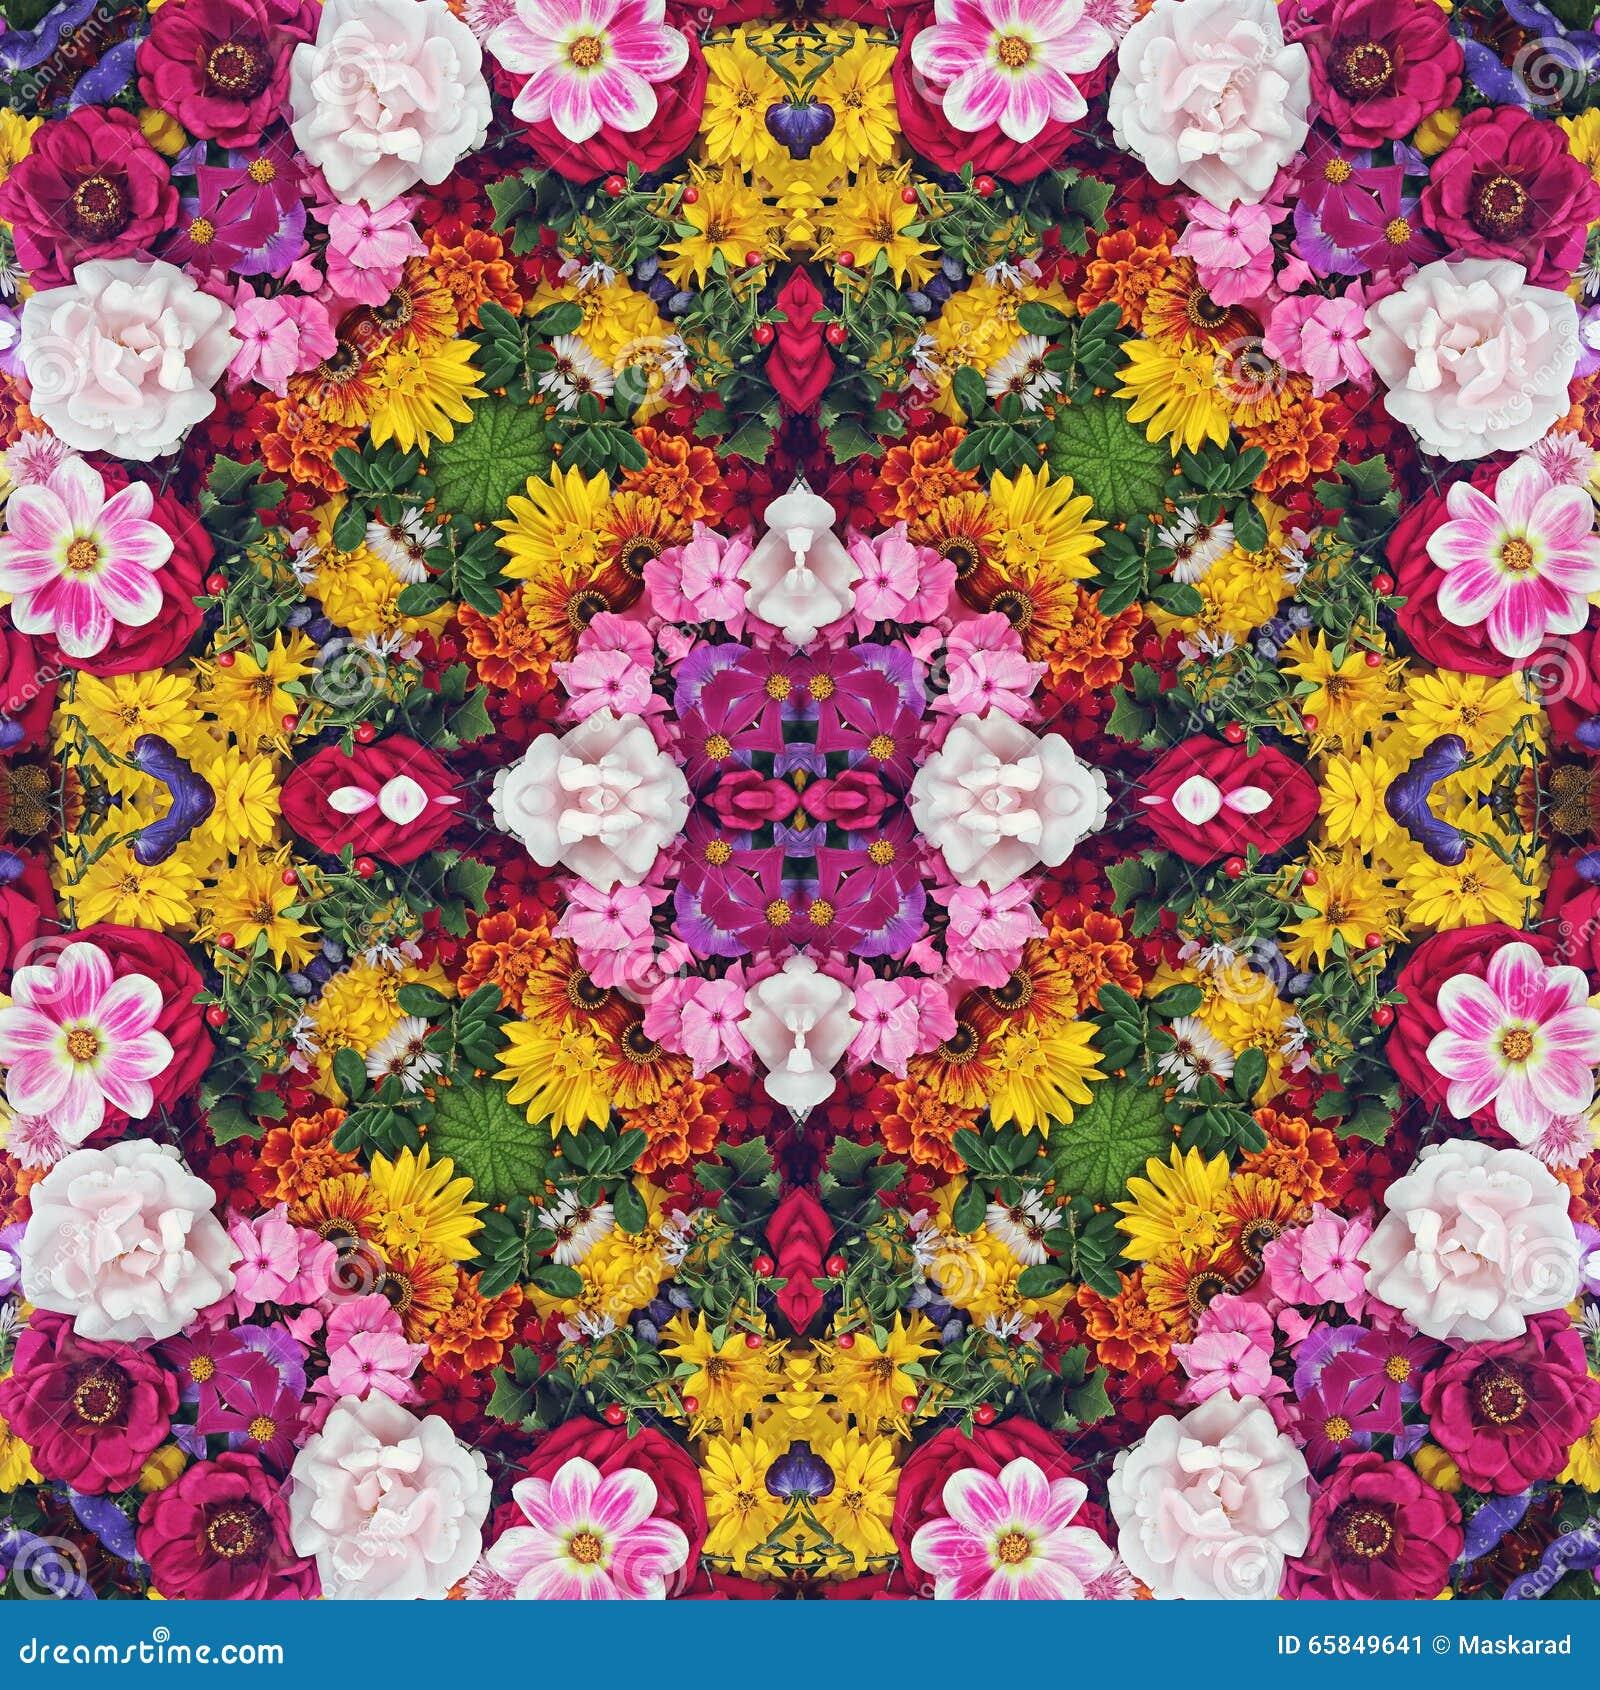 Flower background. Effect of a kaleidoscope.